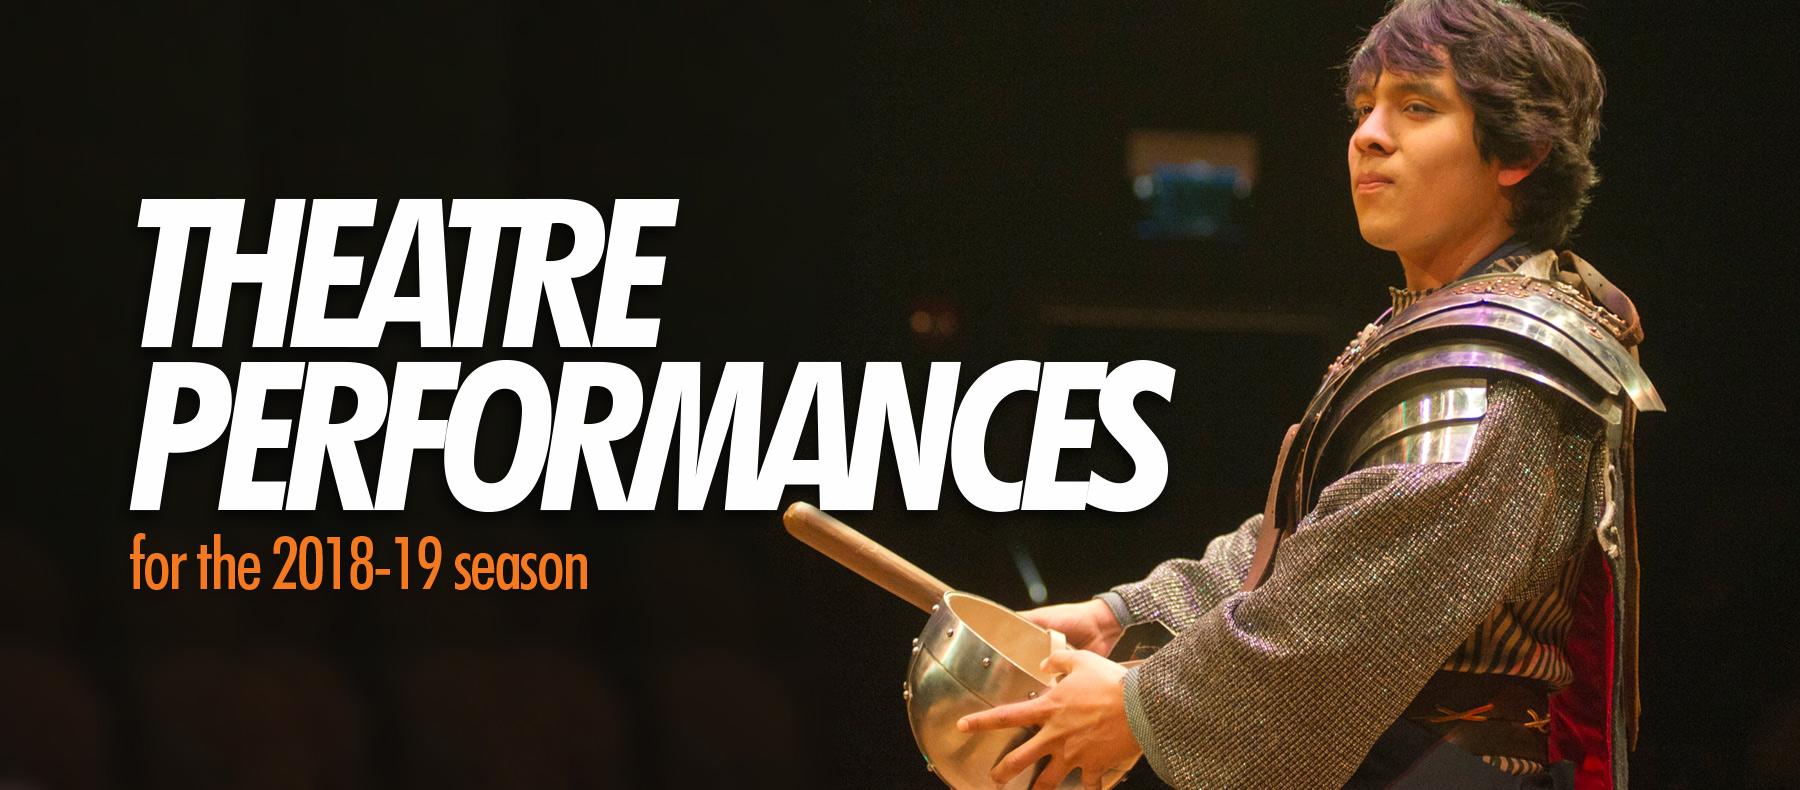 Theatre Performances For The 2018-19 Season